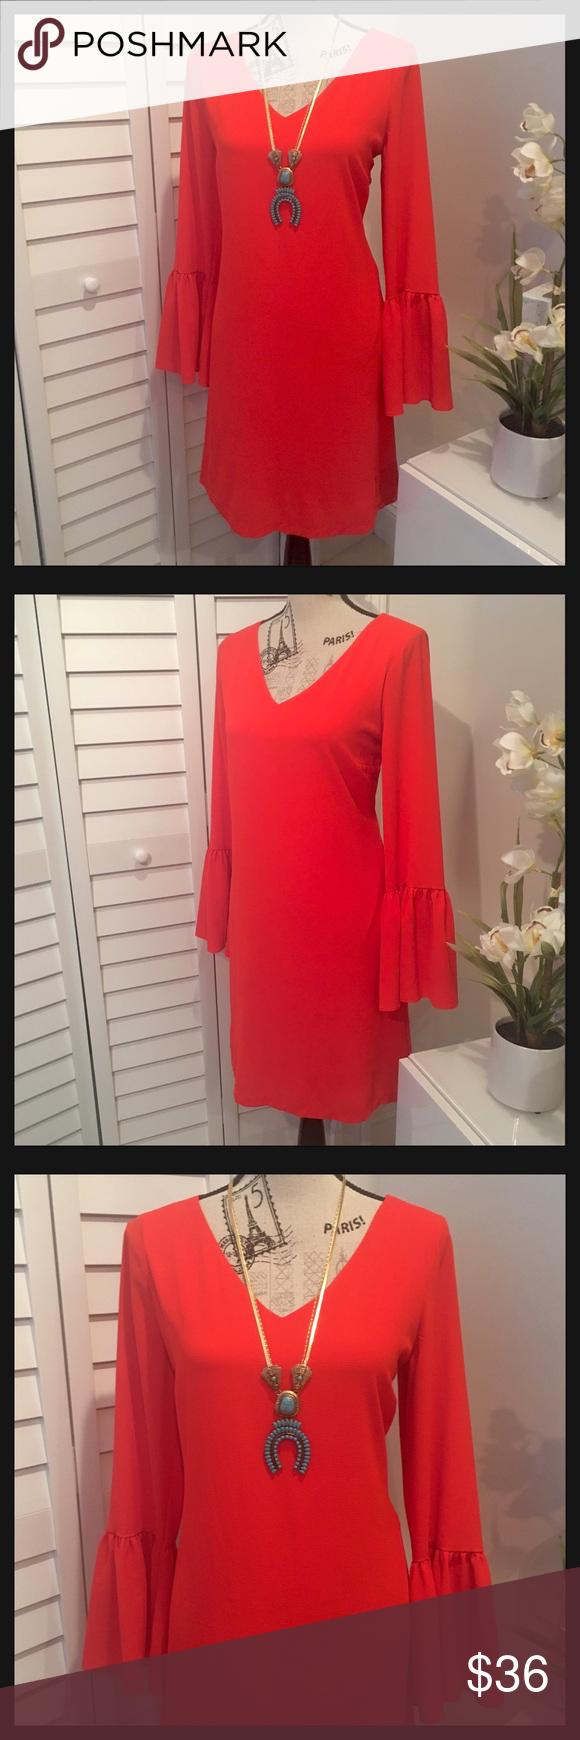 Nwt super cute long ruffle sleeves fiery red dress nwt